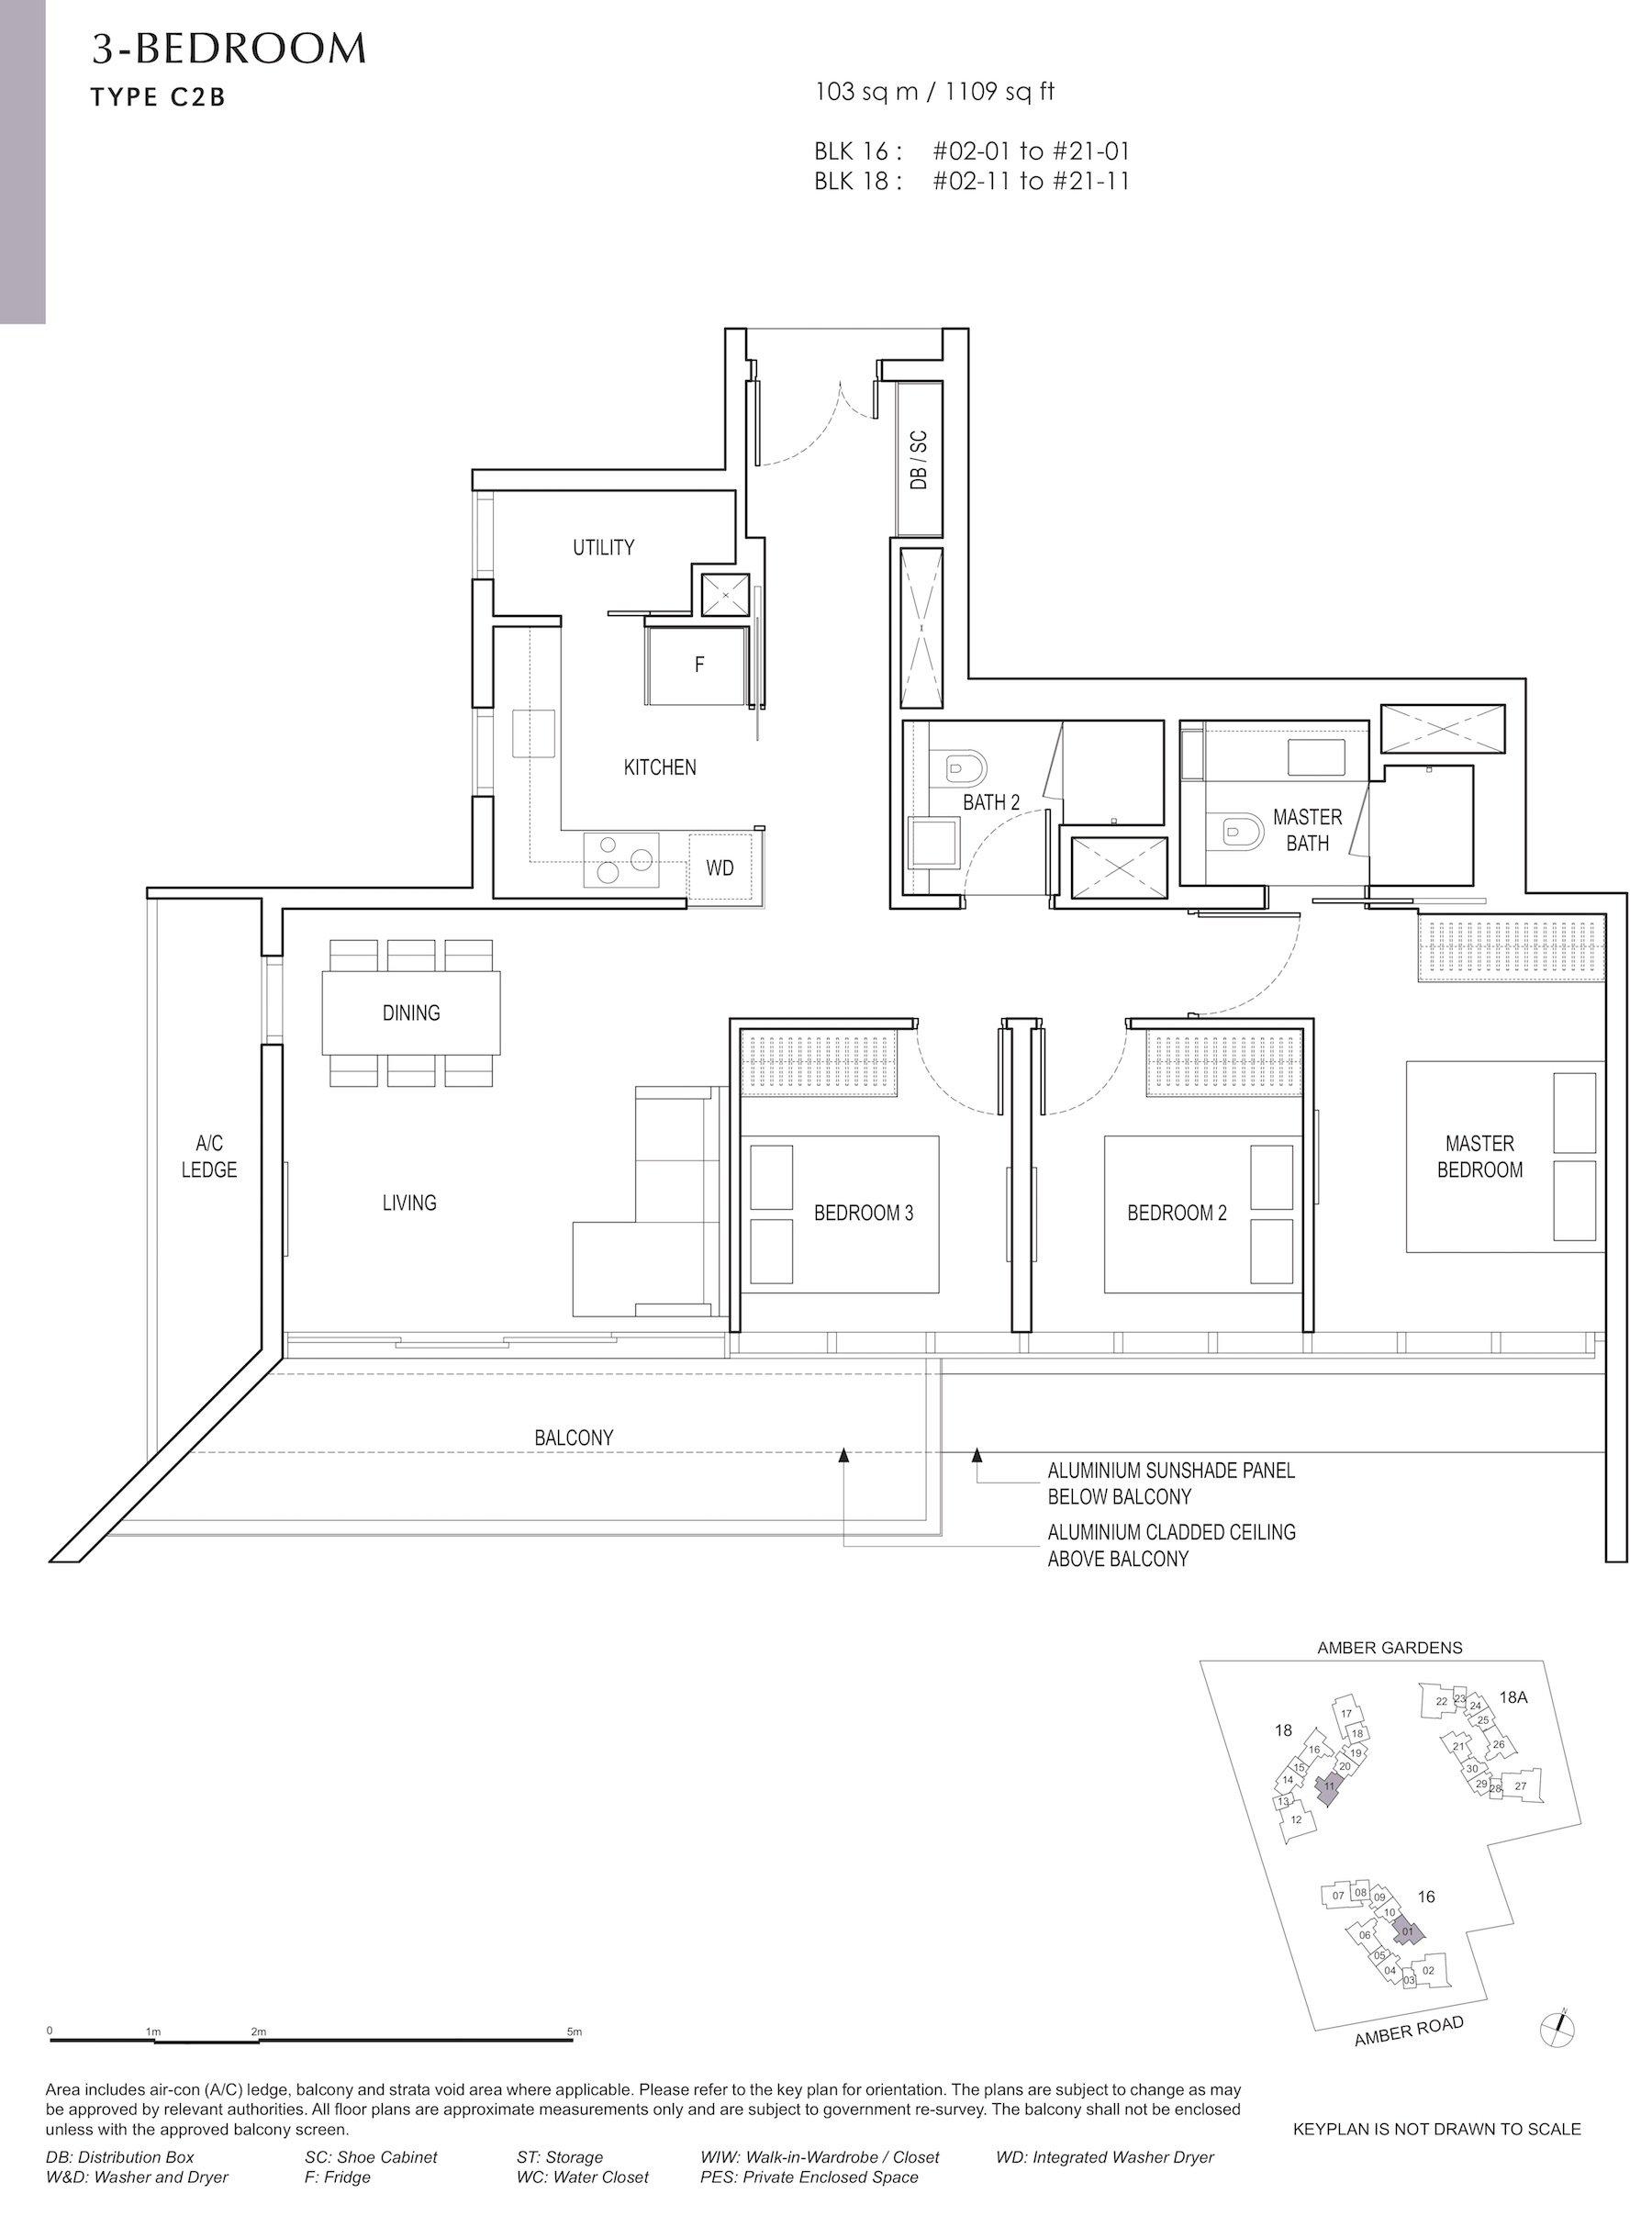 Amber Park 安铂苑 floor plan 3 bedroom 3卧房 C2B